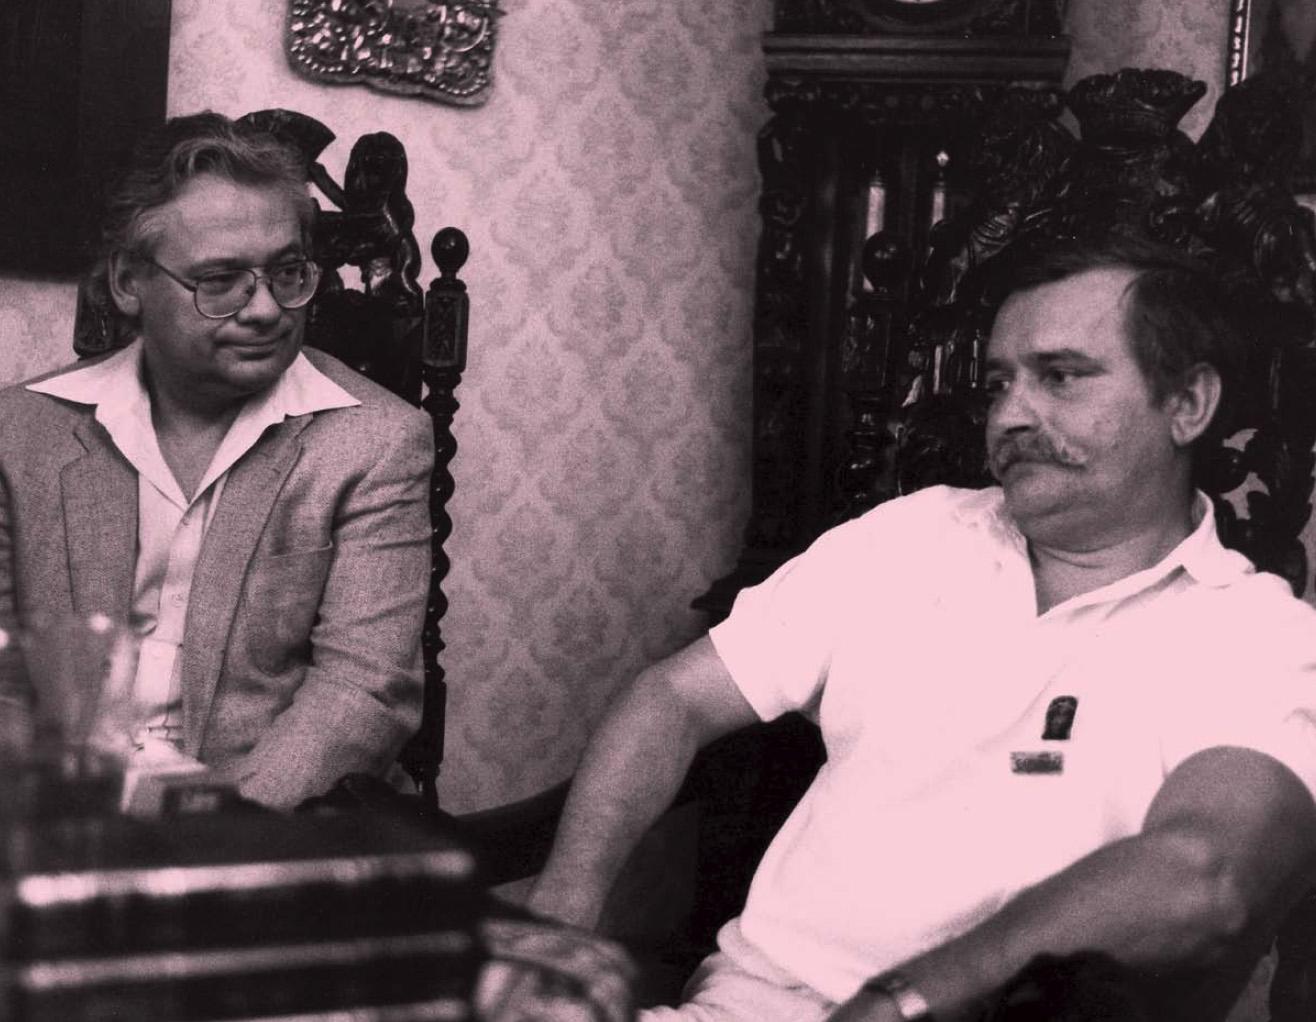 Austrian politician Erhard Busek meets Lech Walesa in 1981 encouraging the Solidarity movement.